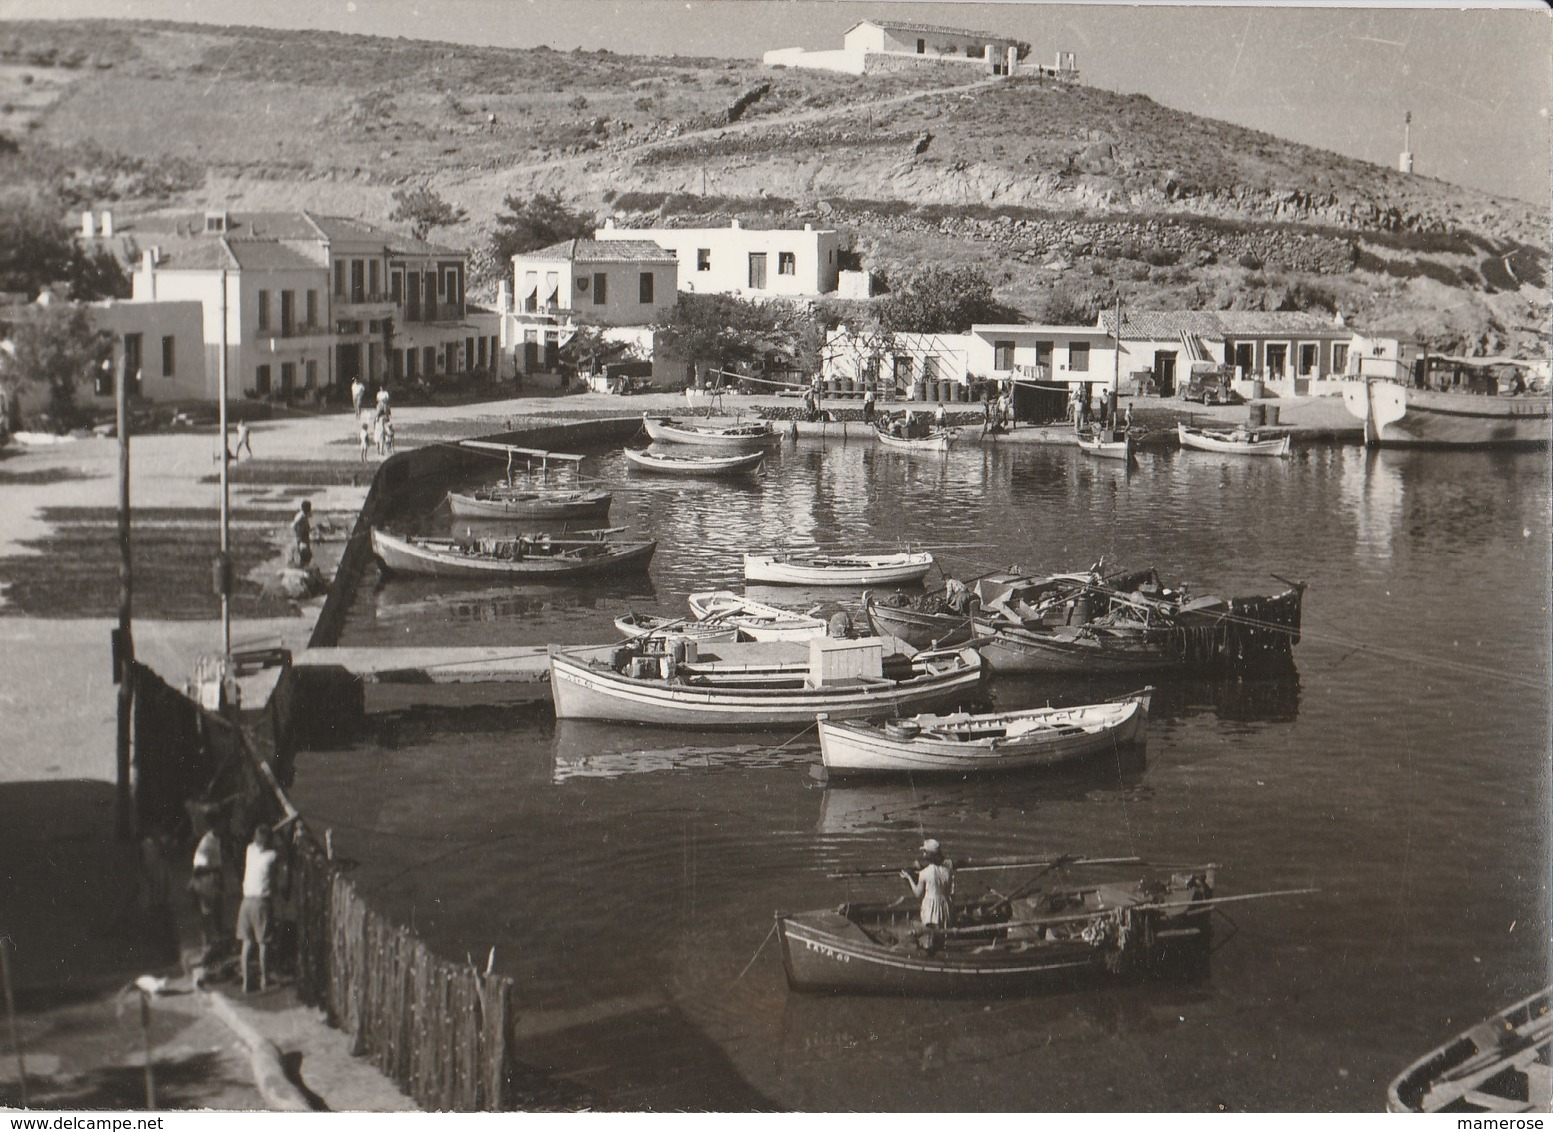 SKYROS (Grèce). Le Port. Barques De Pêcheurs. Photo I. Venardi - Greece